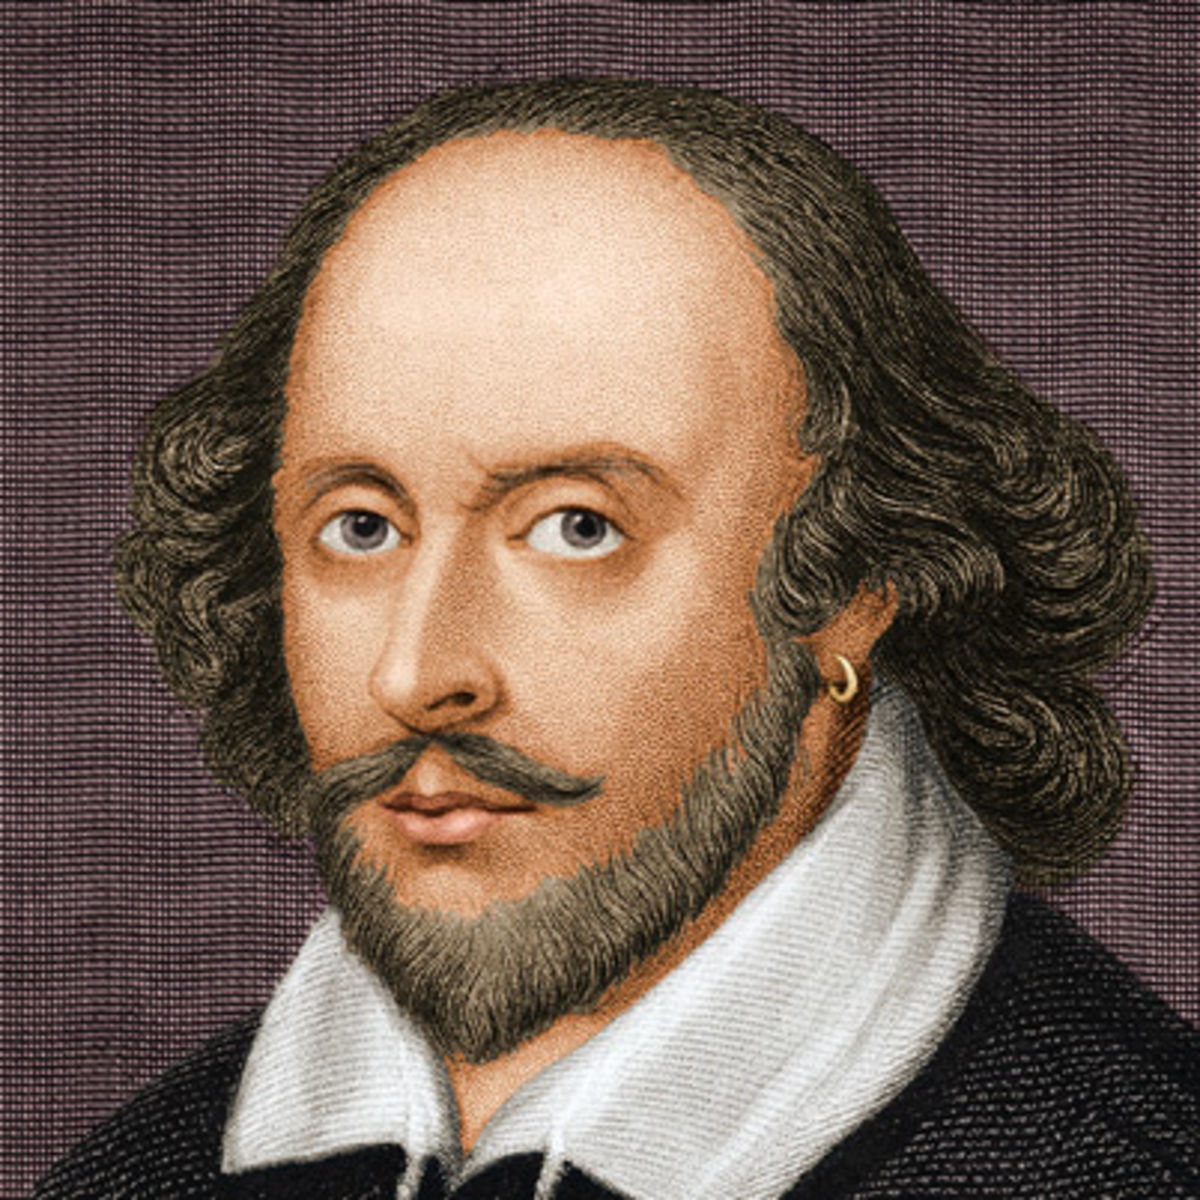 William Shakespeare ovvero Michelangelo Florio Crollalanza